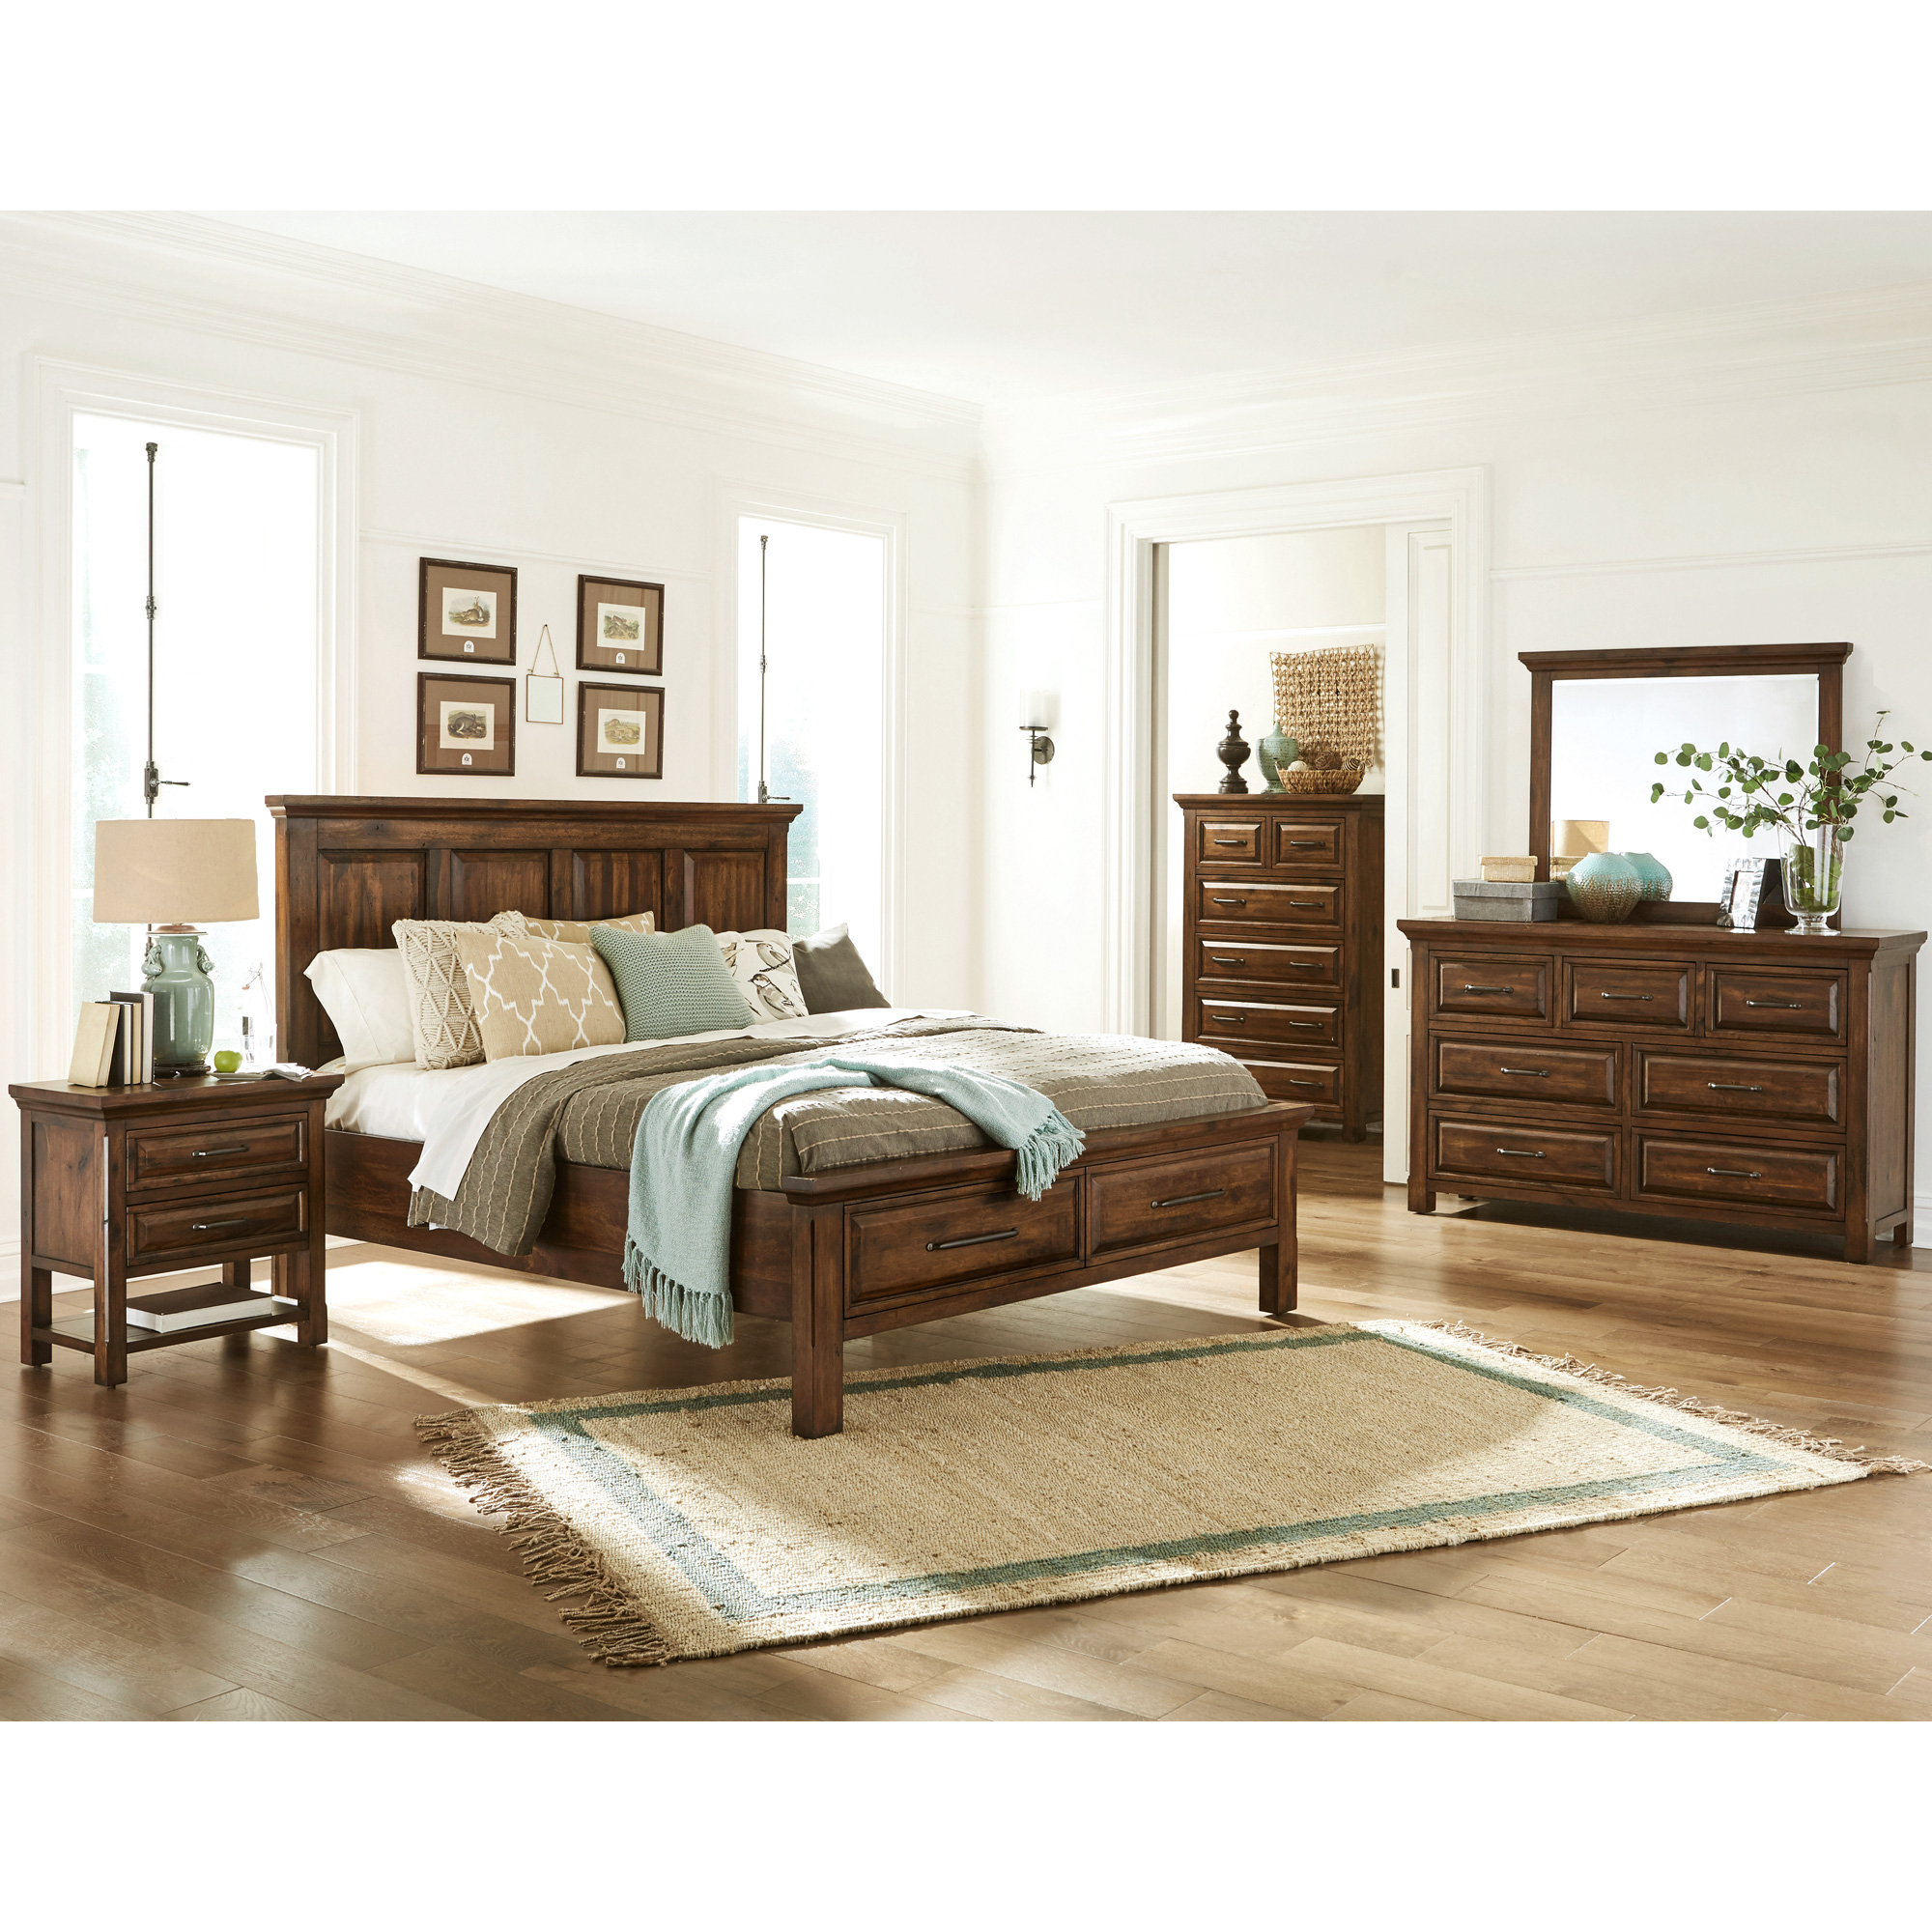 Napa Furniture | Hill Crest Dark Chestnut Queen 4 Piece Room Group Bedroom Set